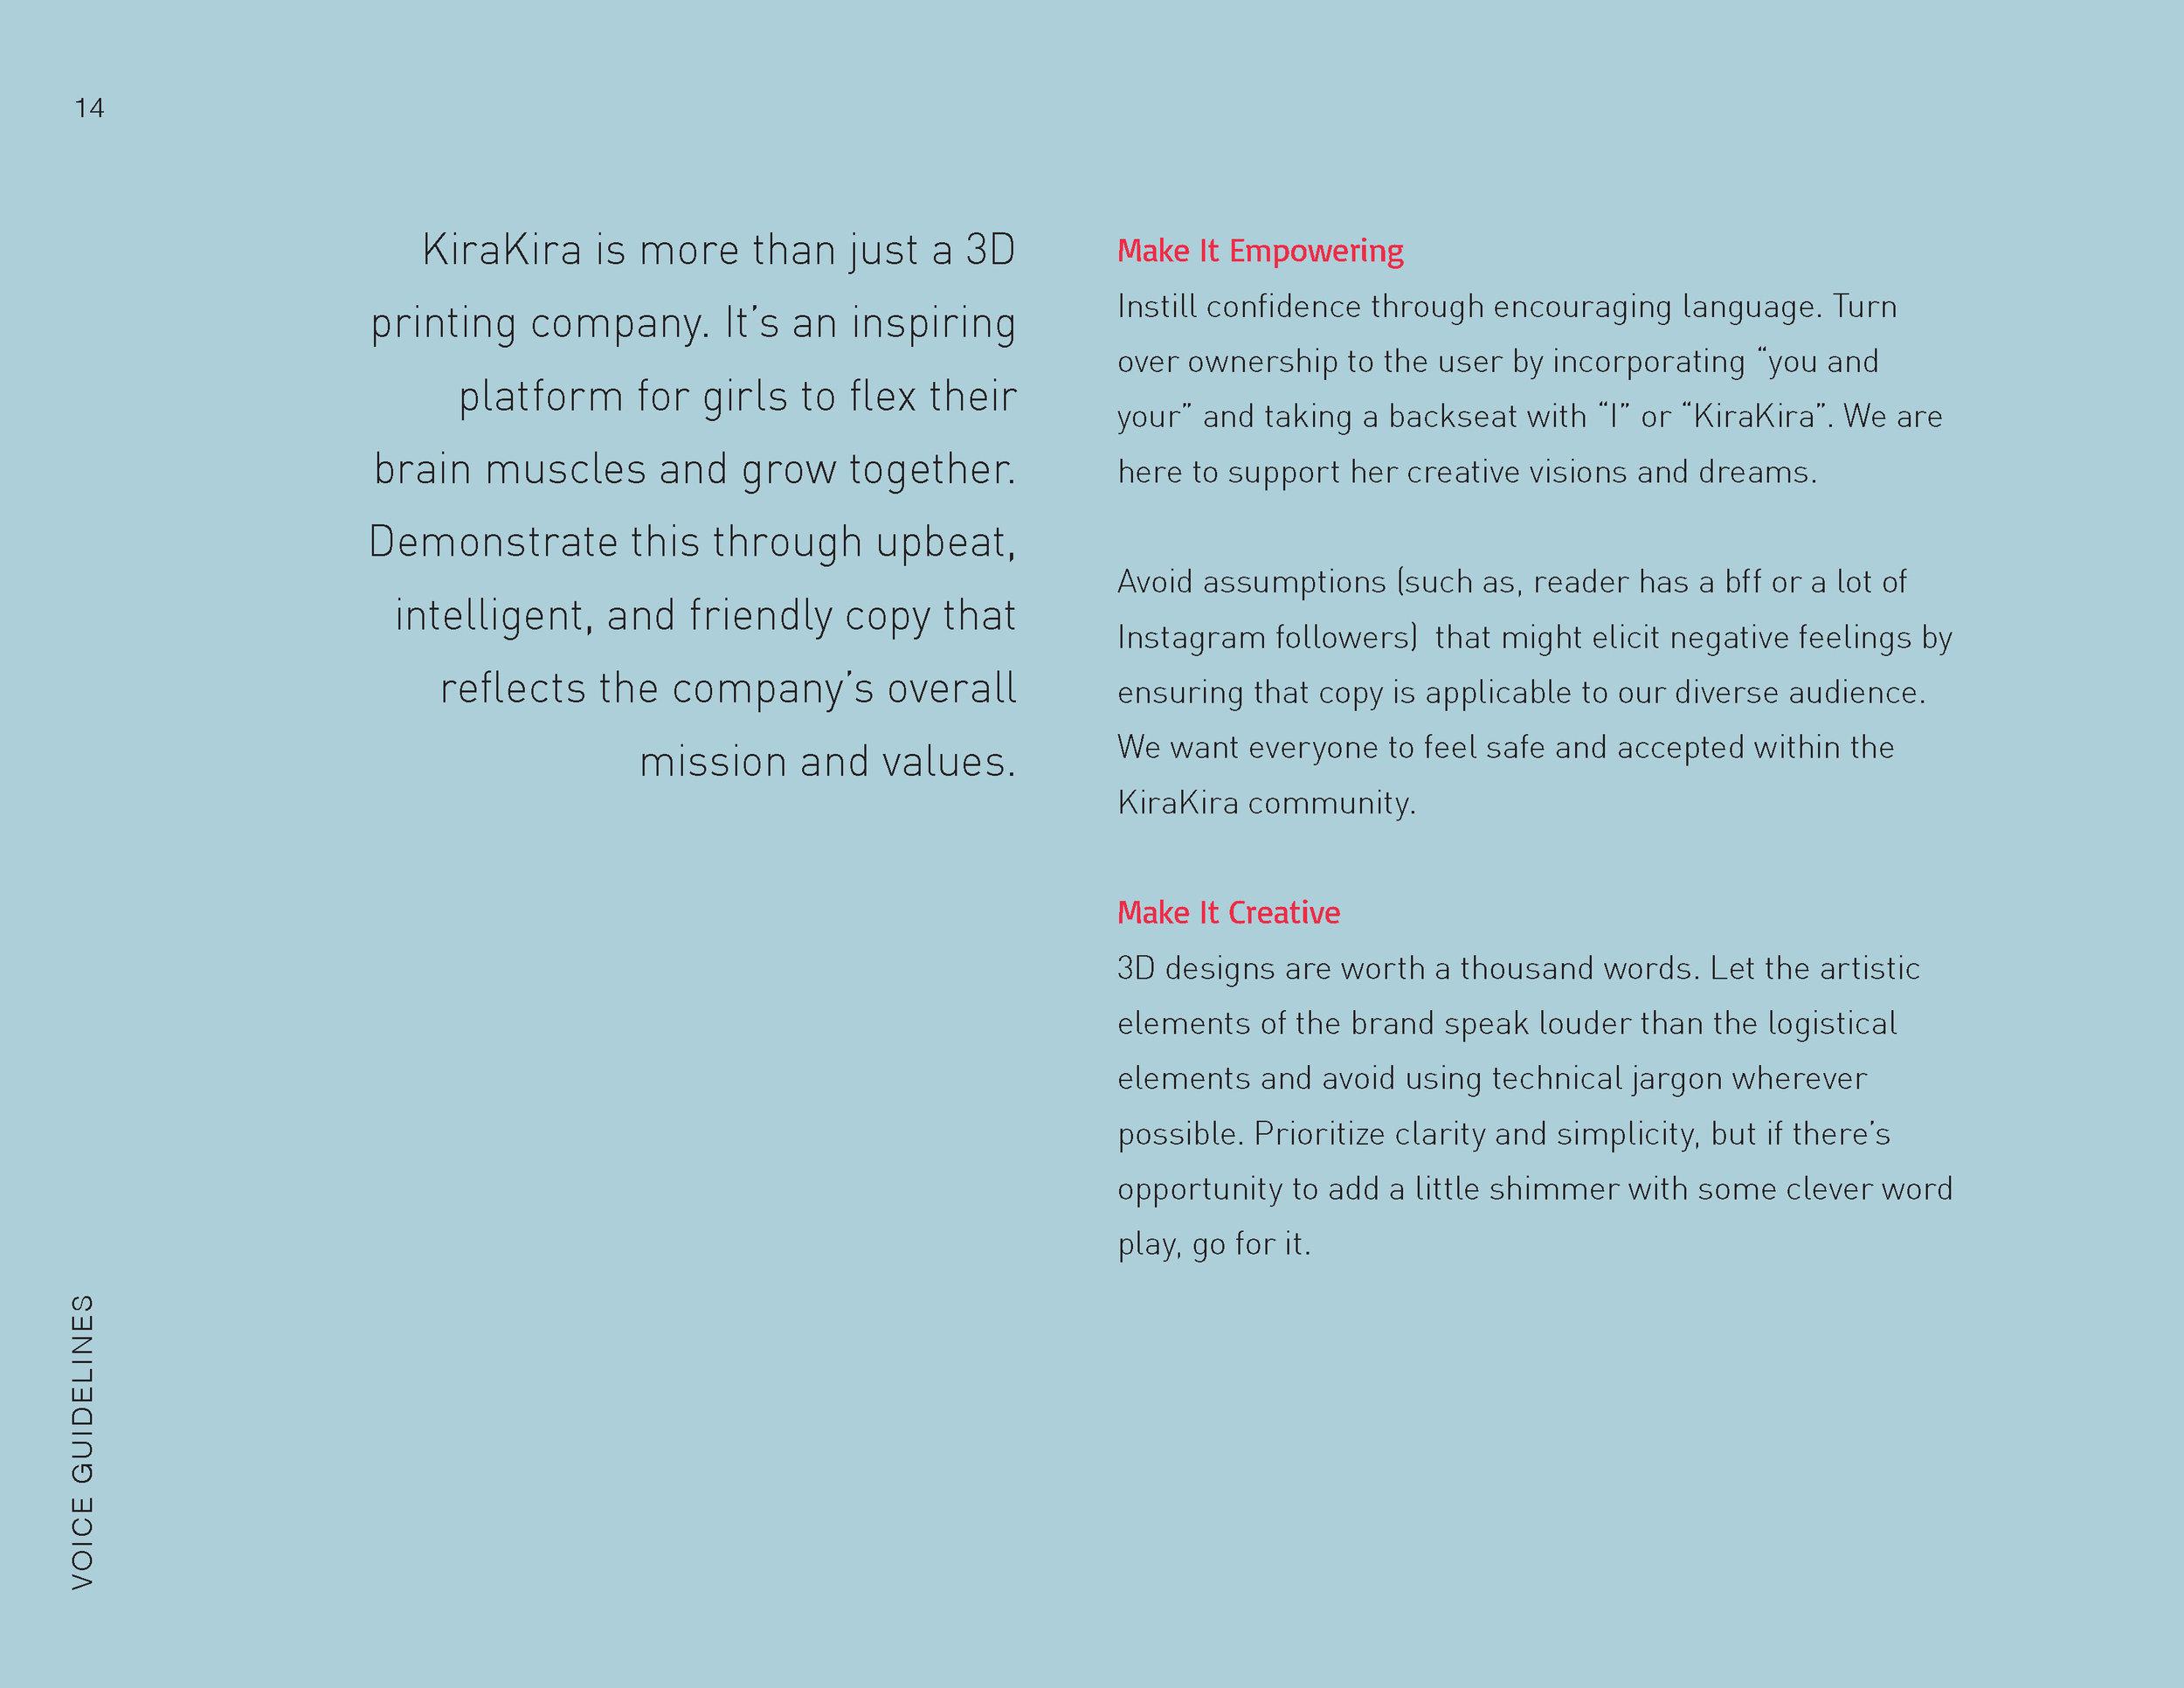 kirakira-brand-guide_Page_14.jpg